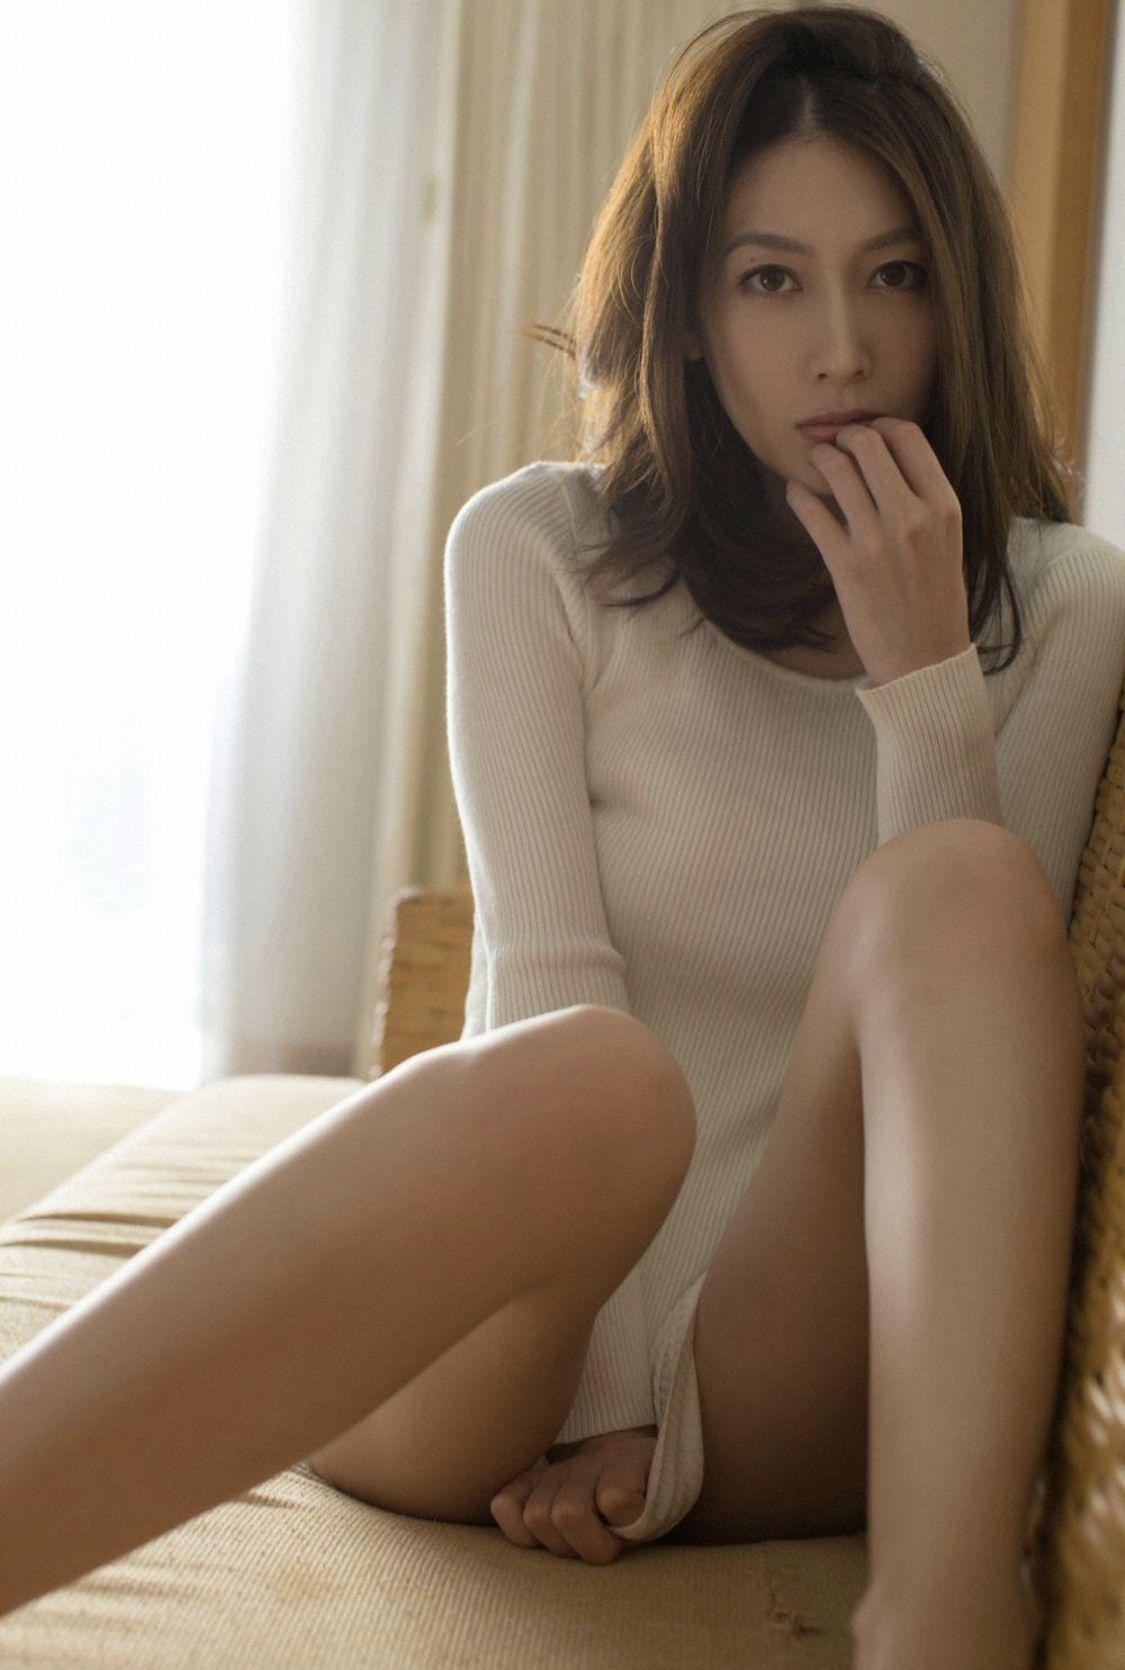 Hottest naked black girl